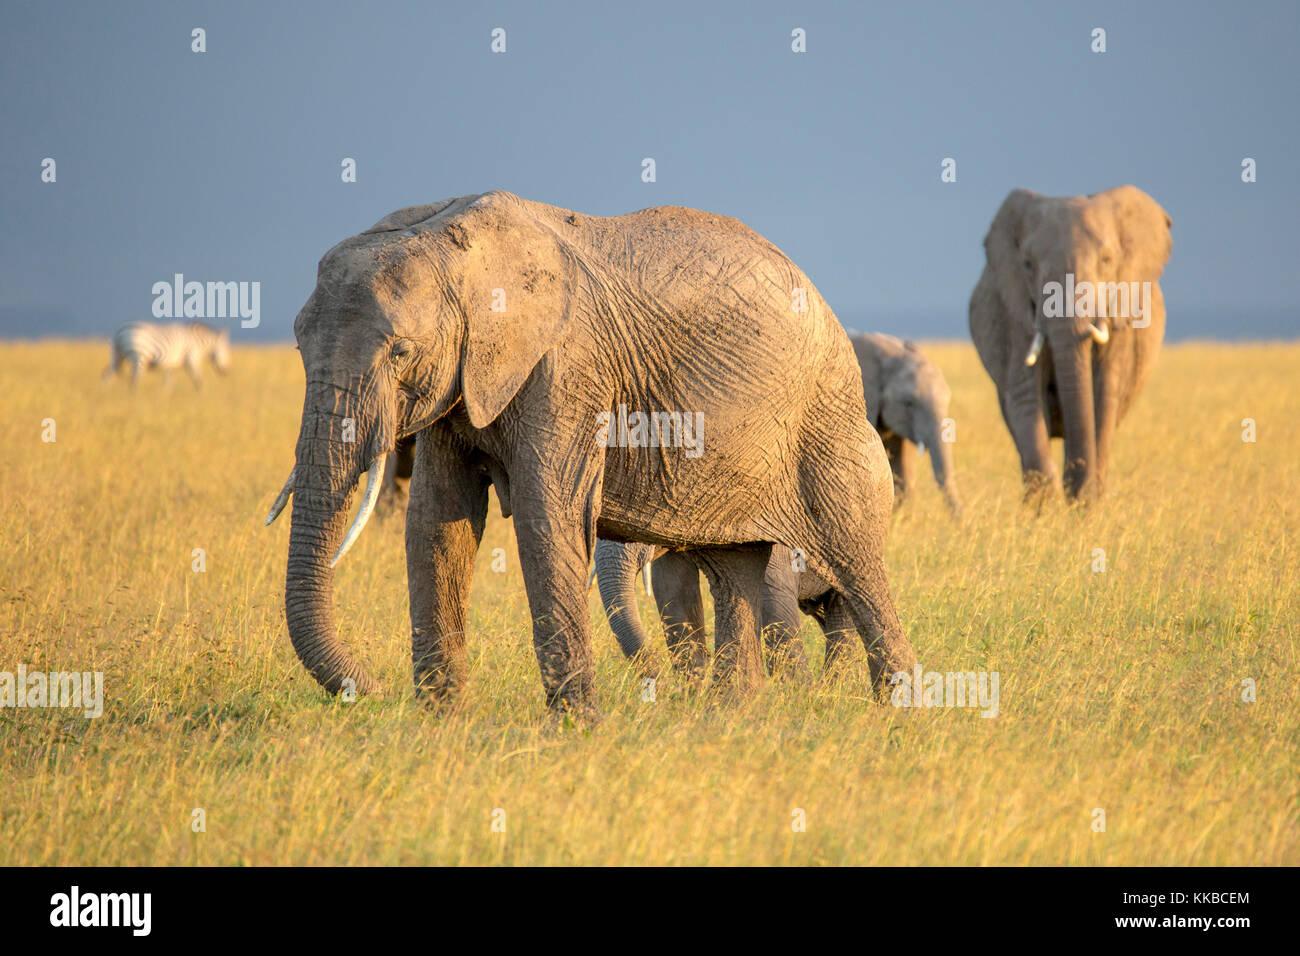 family of elephants walking across open grassland, wide format, Laikipia Kenya Africa - Stock Image